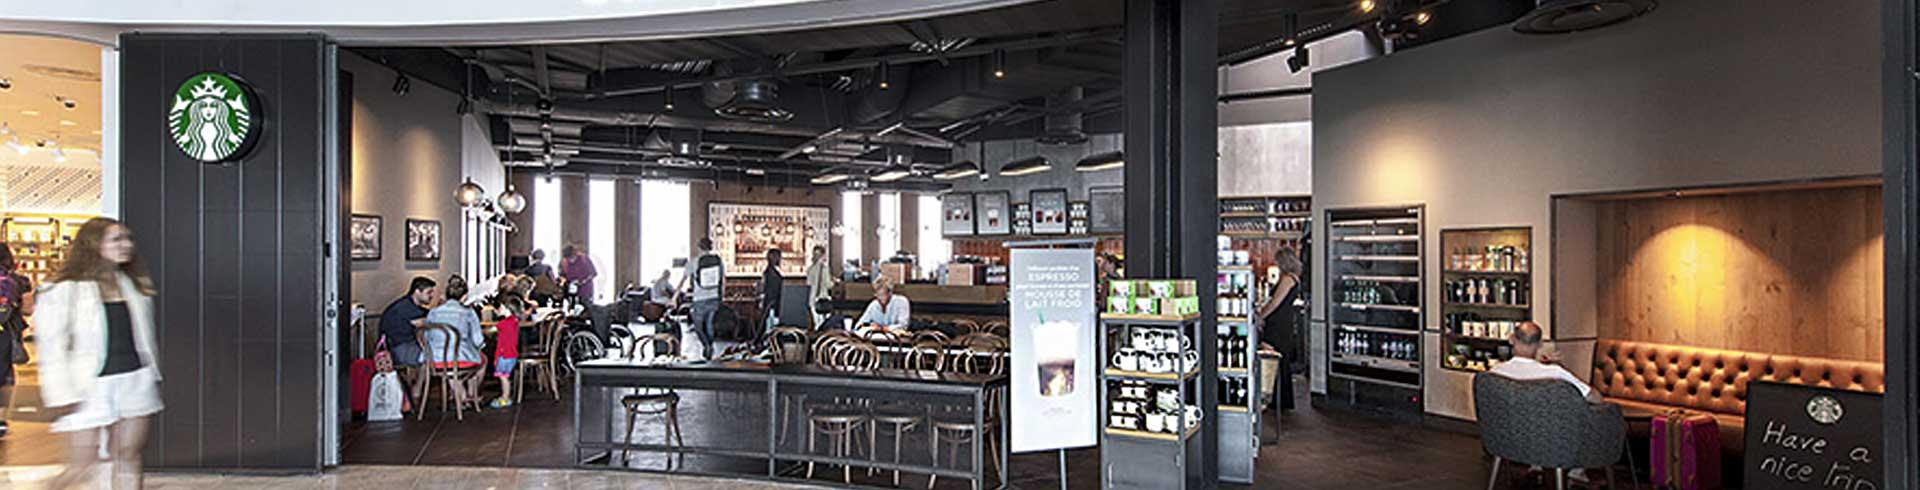 Restaurantsamp; Terminal Starbucks 1 Services Bars Boutiques bg7Y6fy